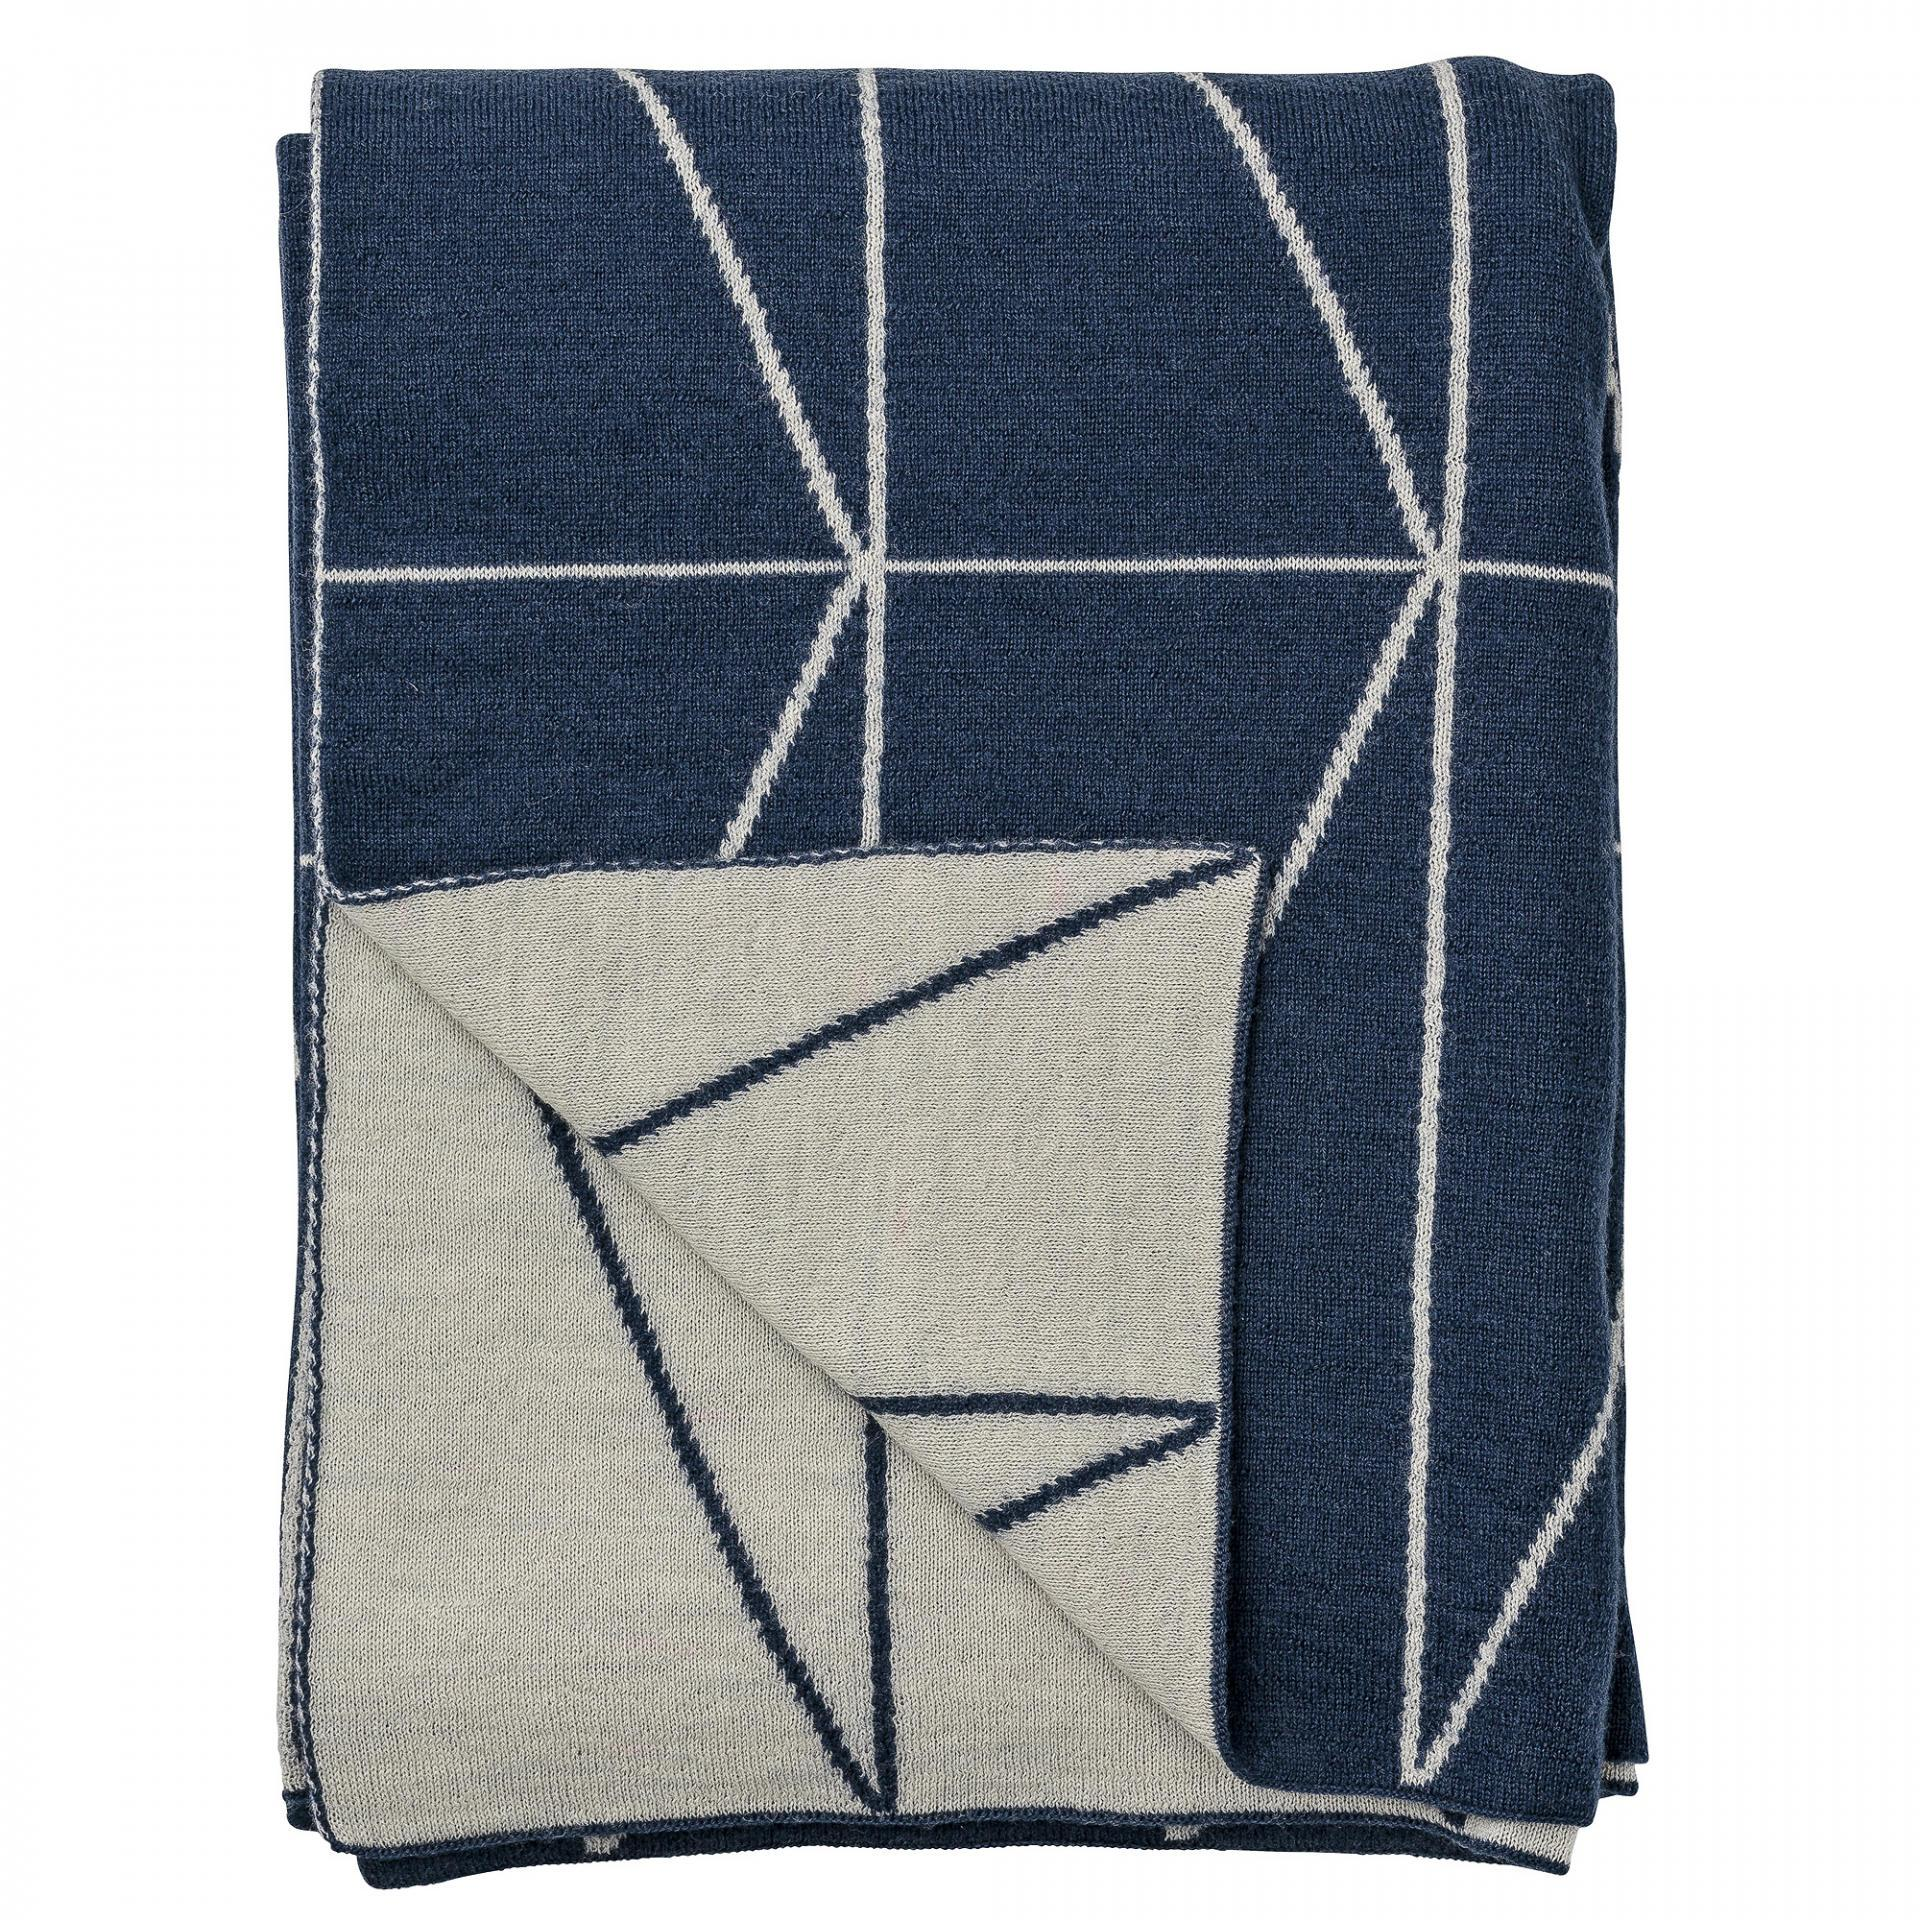 Bloomingville Pletený přehoz Indigo Blue Zig-Zag 130x170 cm, modrá barva, šedá barva, textil